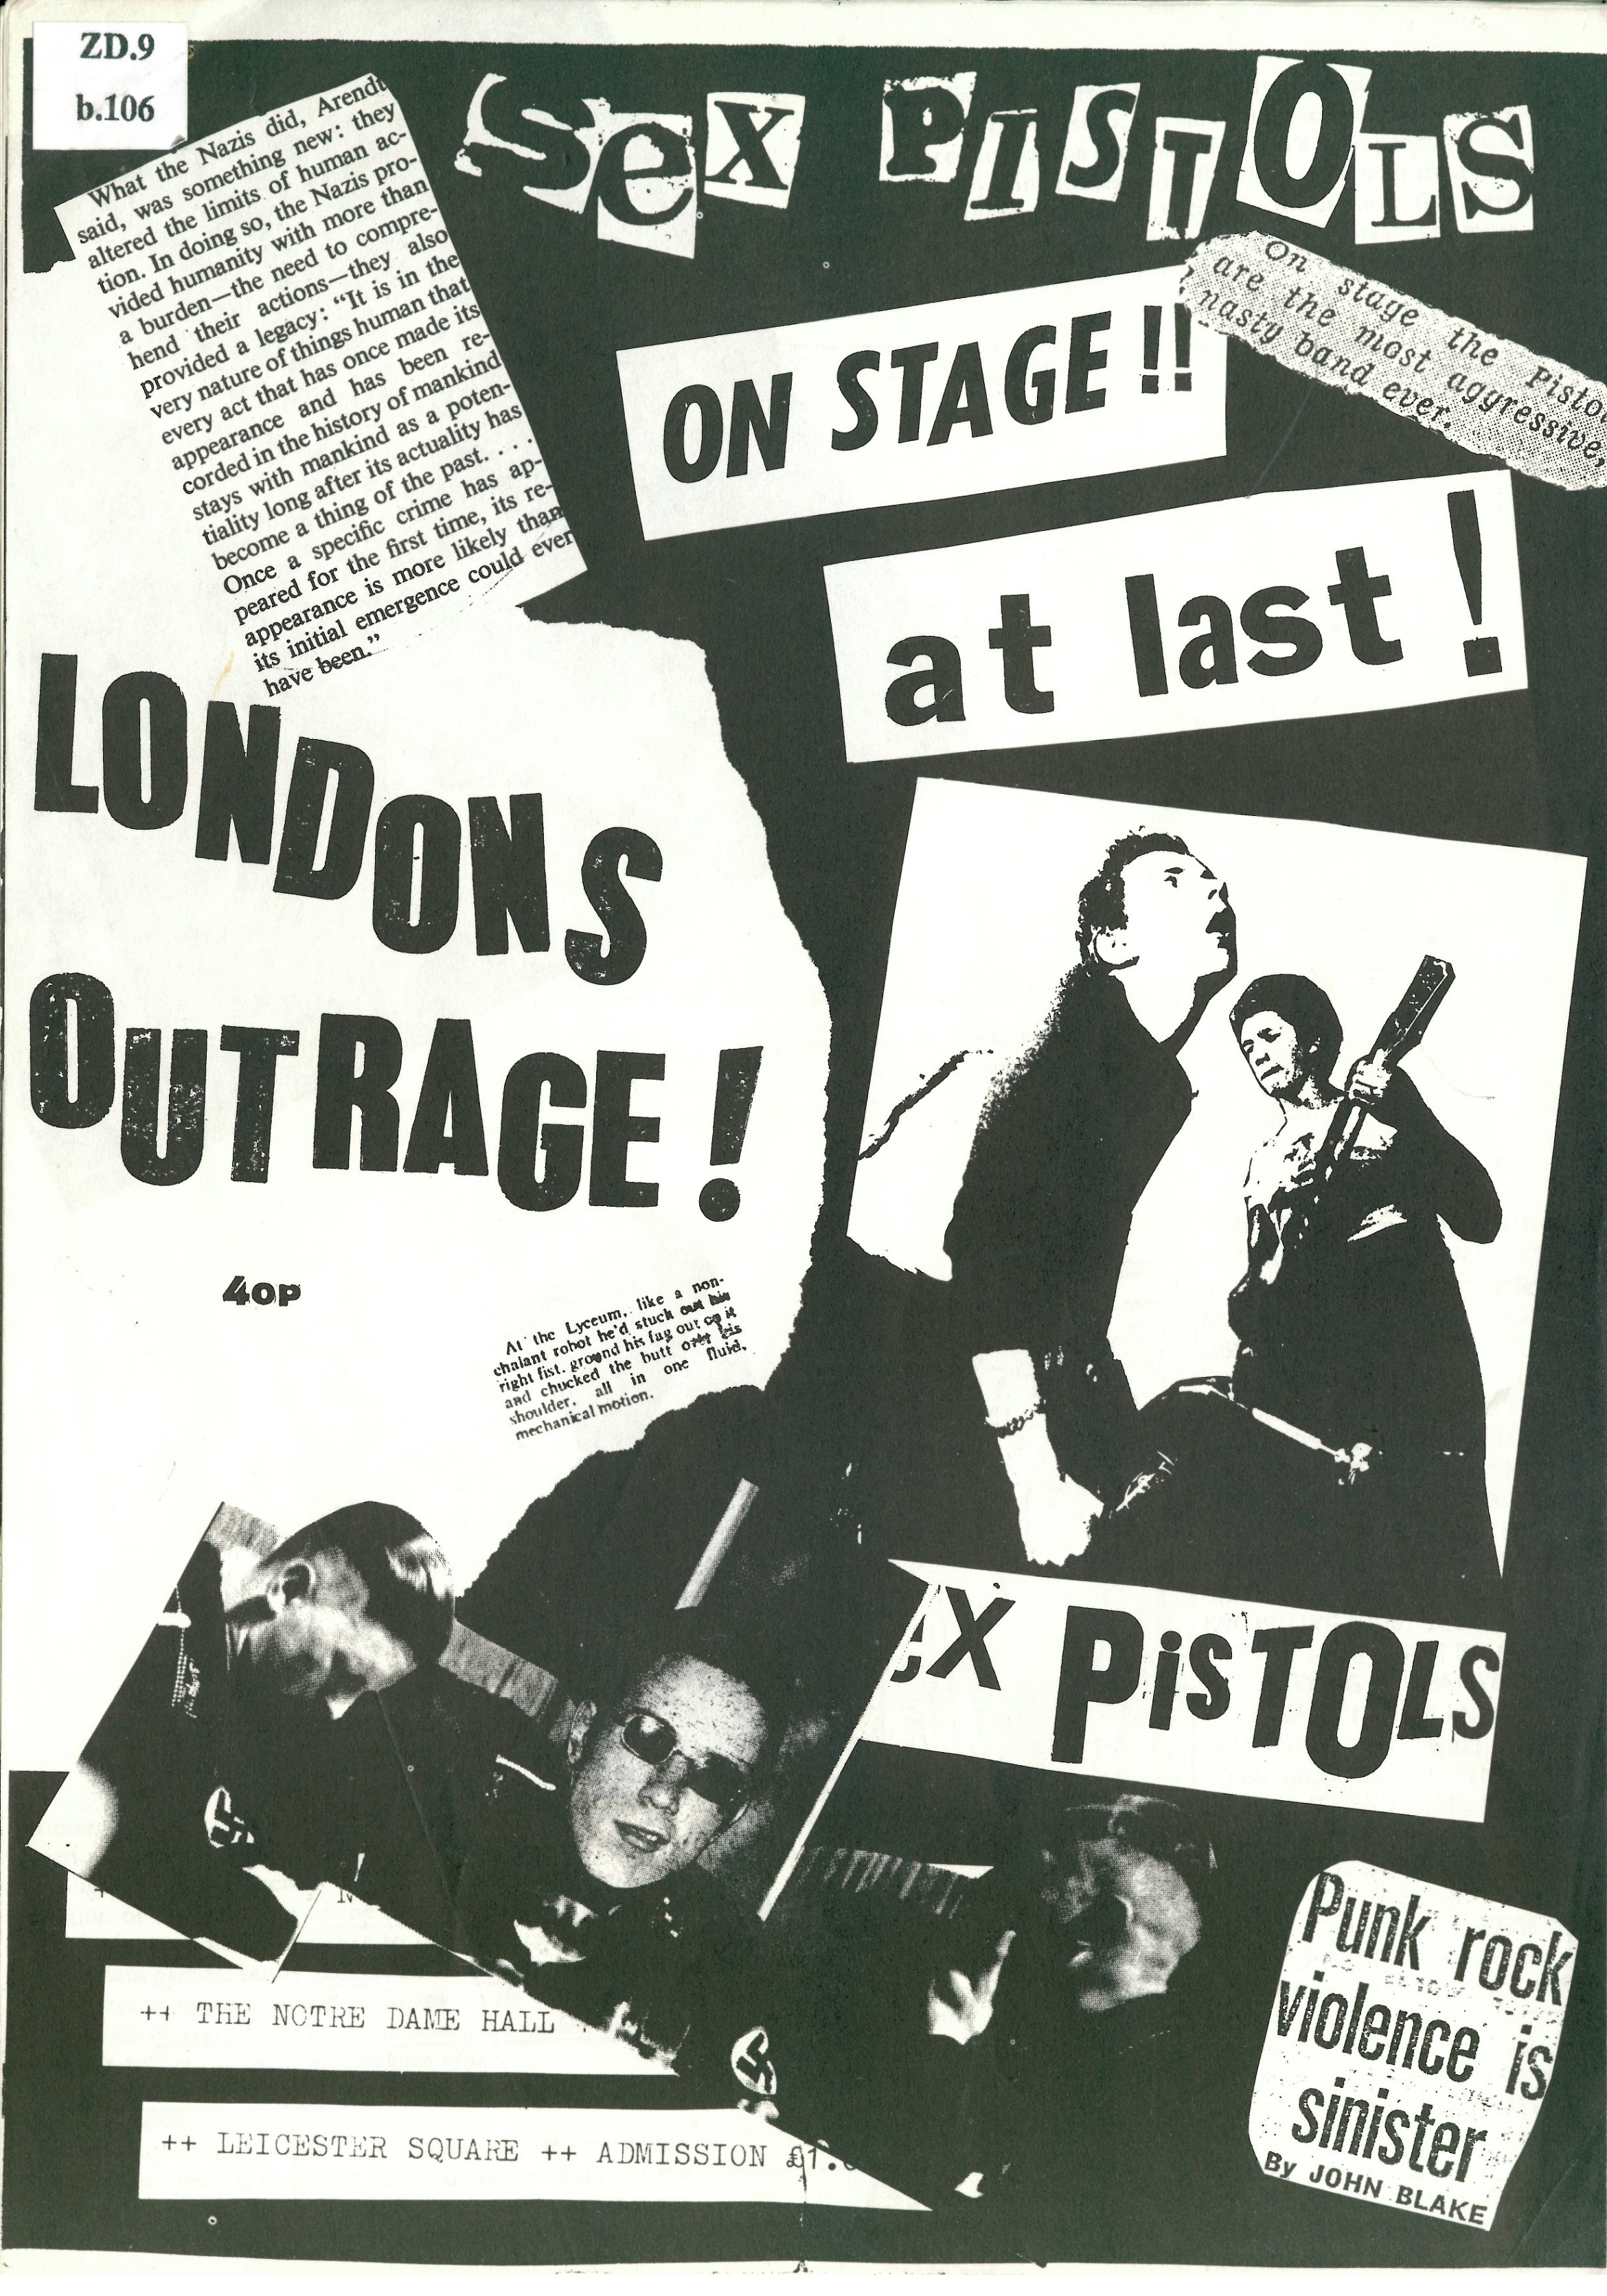 london-outrage-fanzine-by-jon-savage.jpg